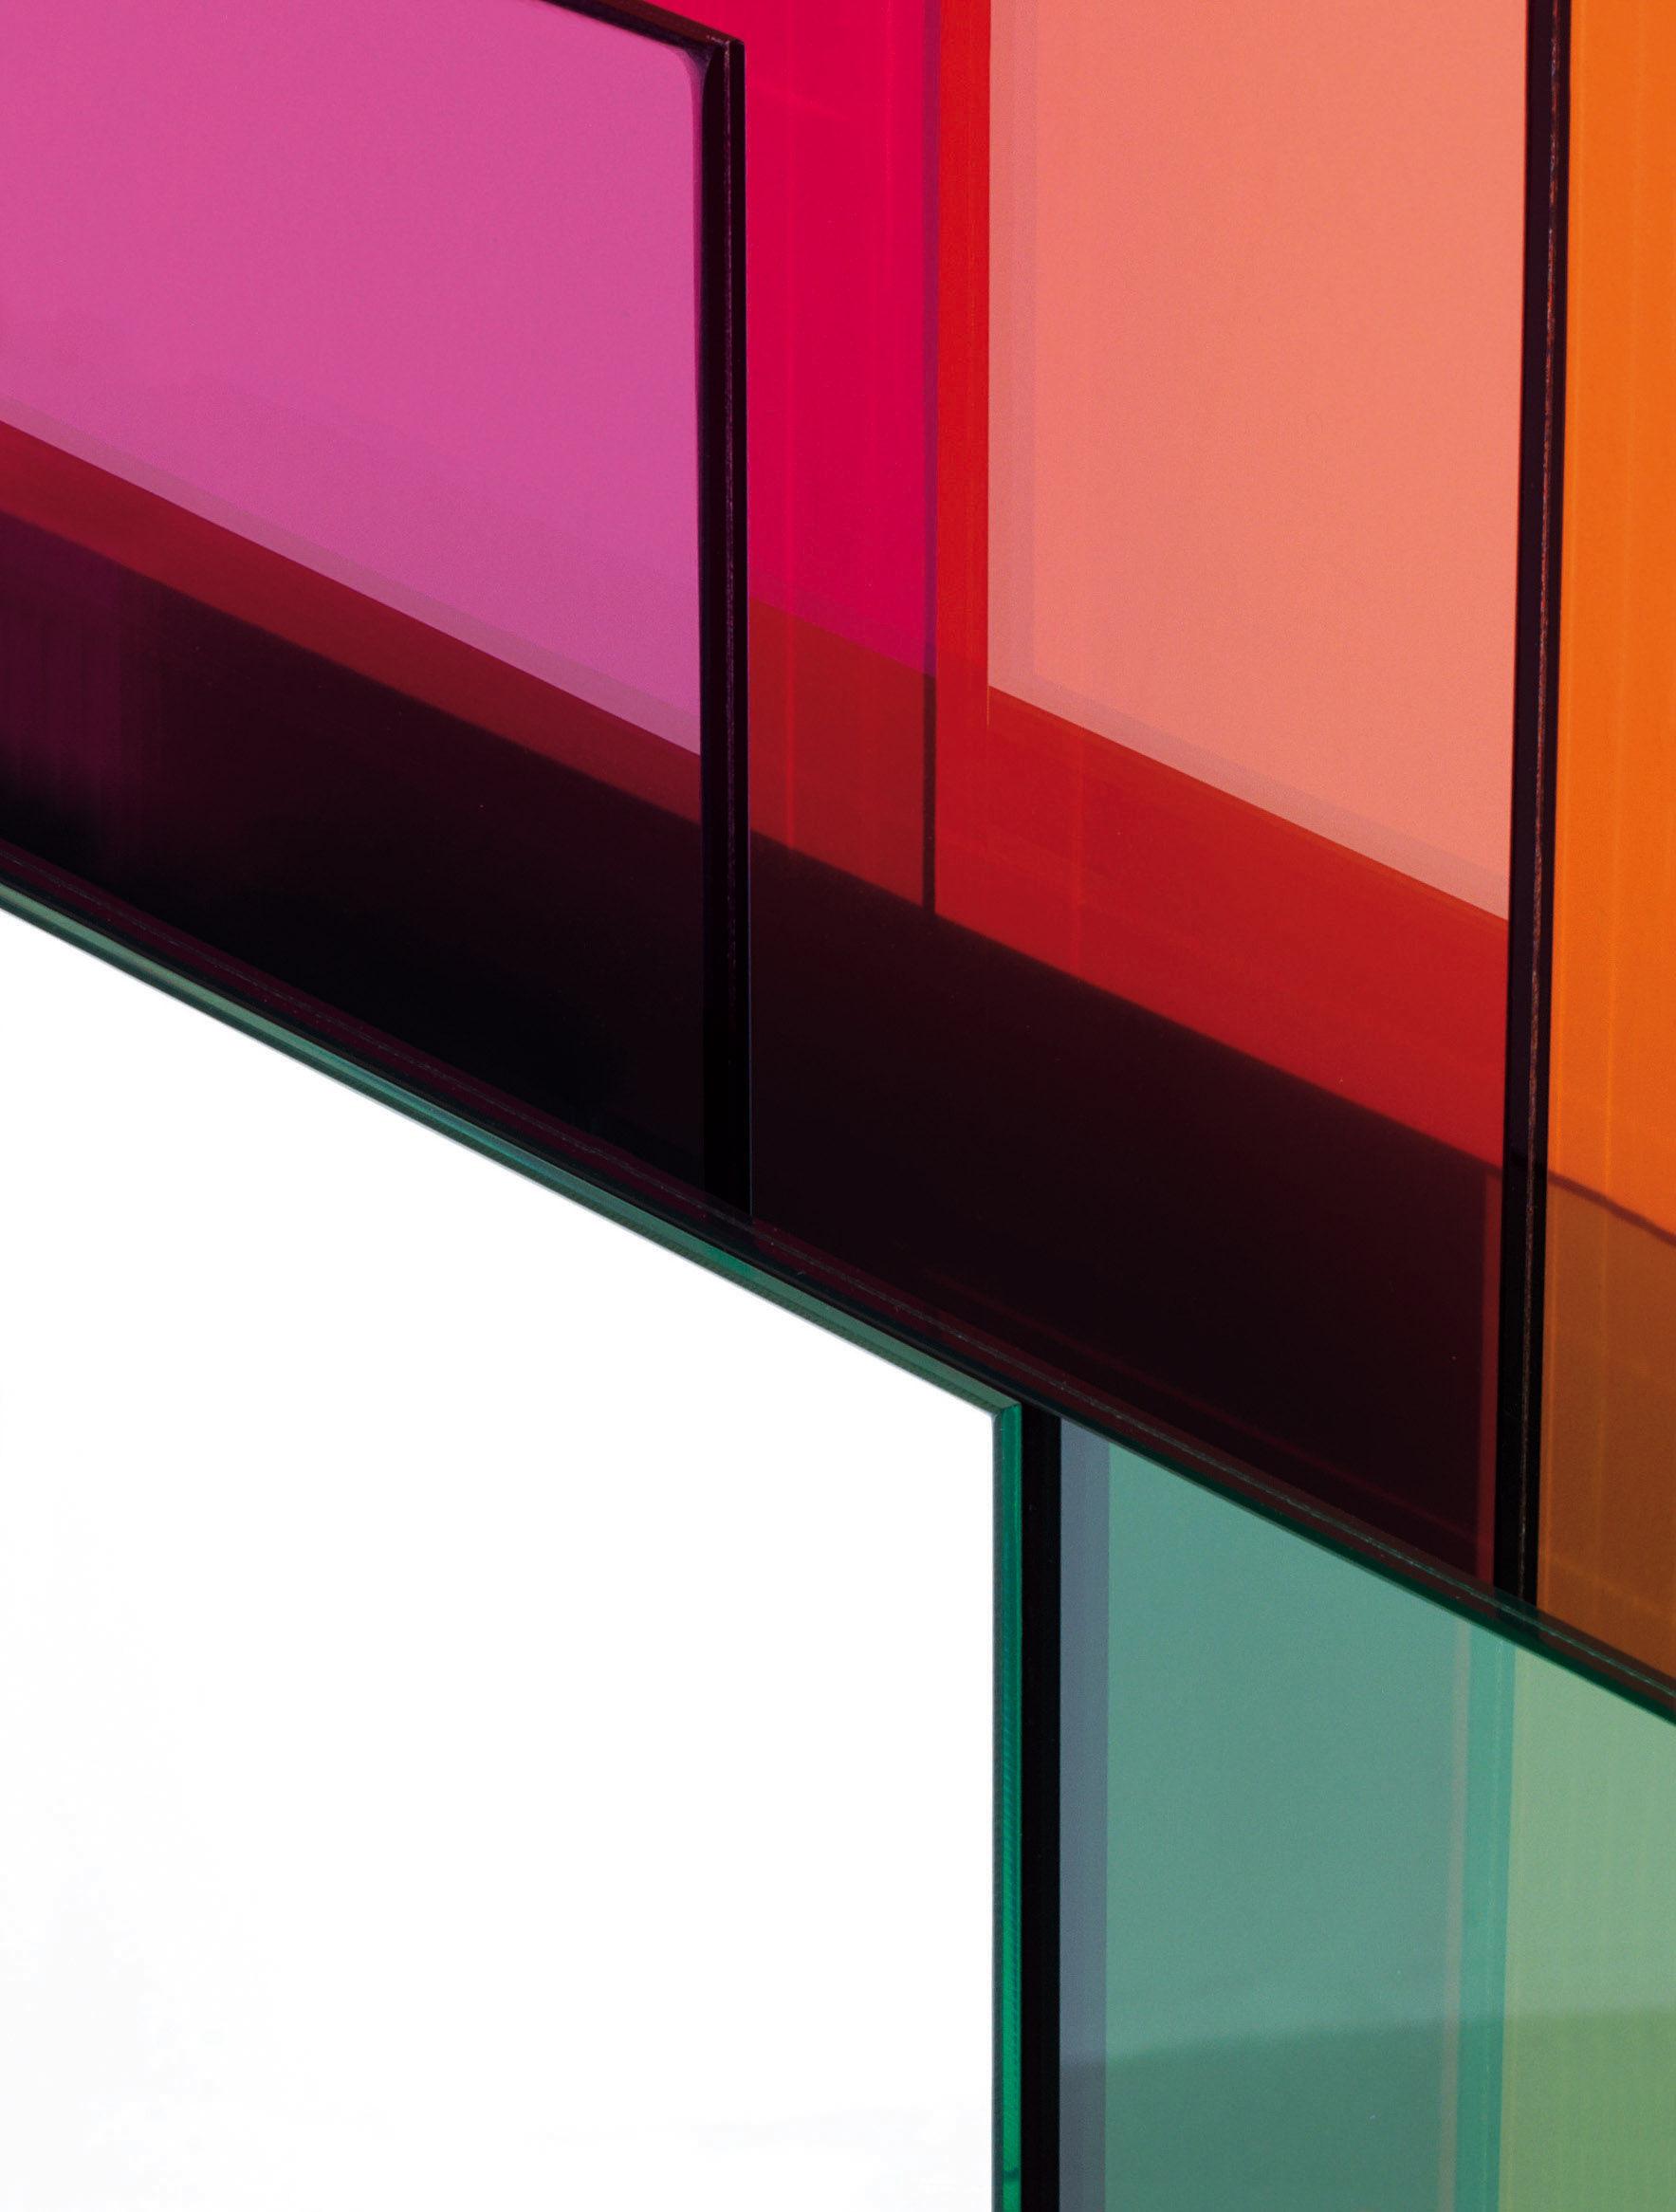 Miroir mural colour on colour 55 x 55 cm bleu clair rose rouge vert glas italia for Miroir mural original